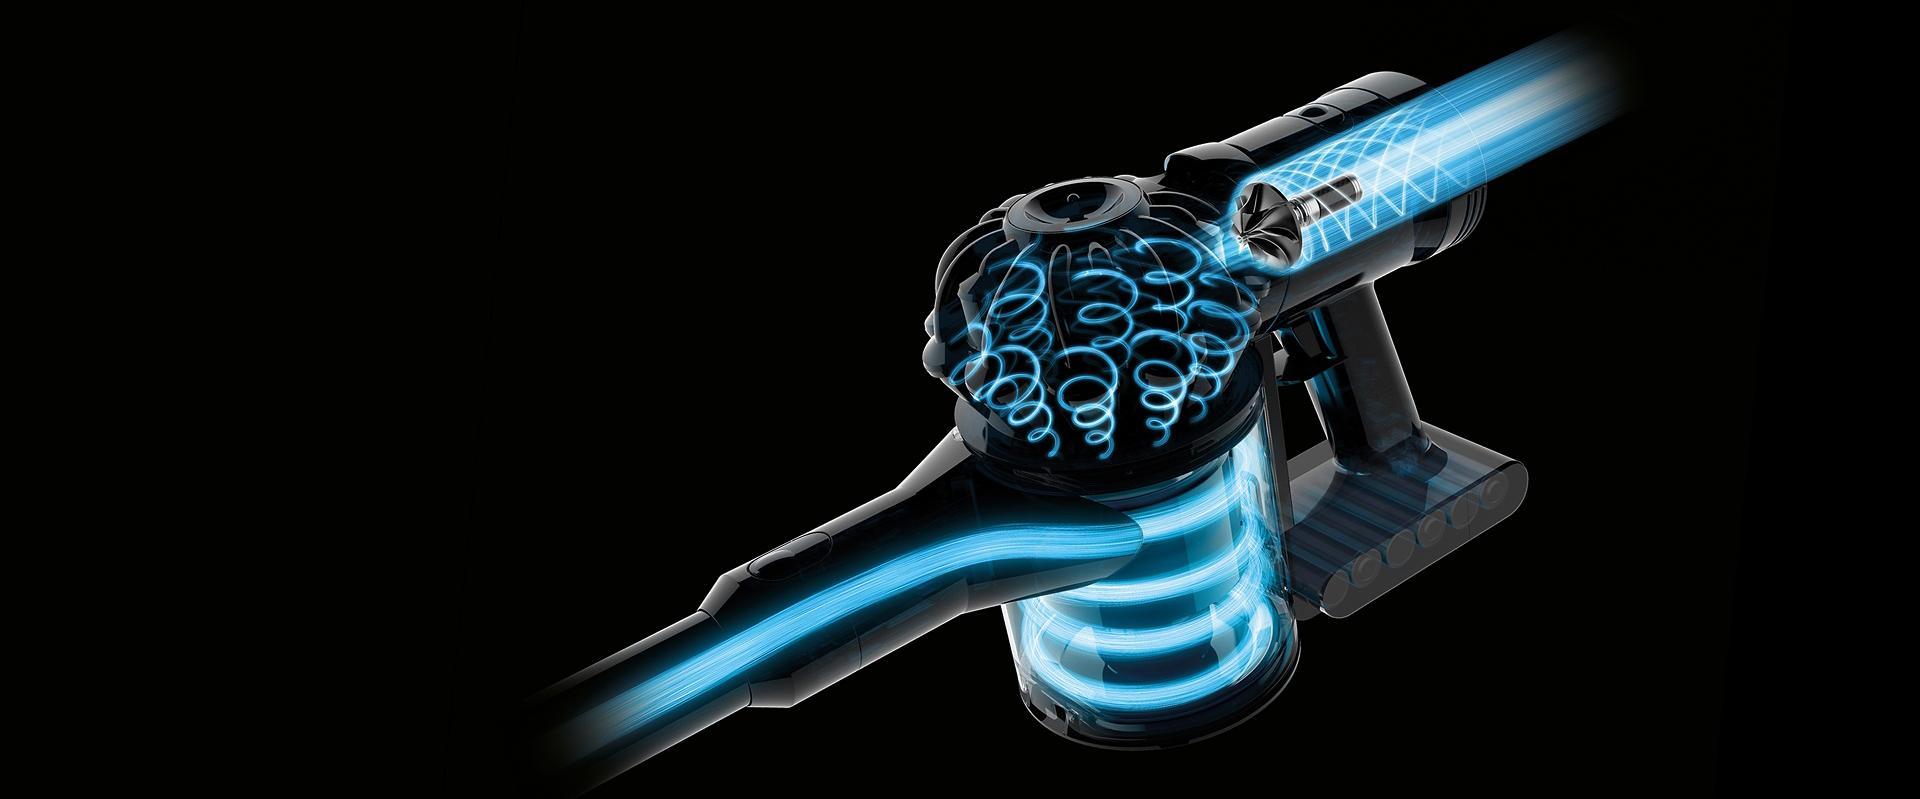 Dyson V7™ vacuum airflow schematic